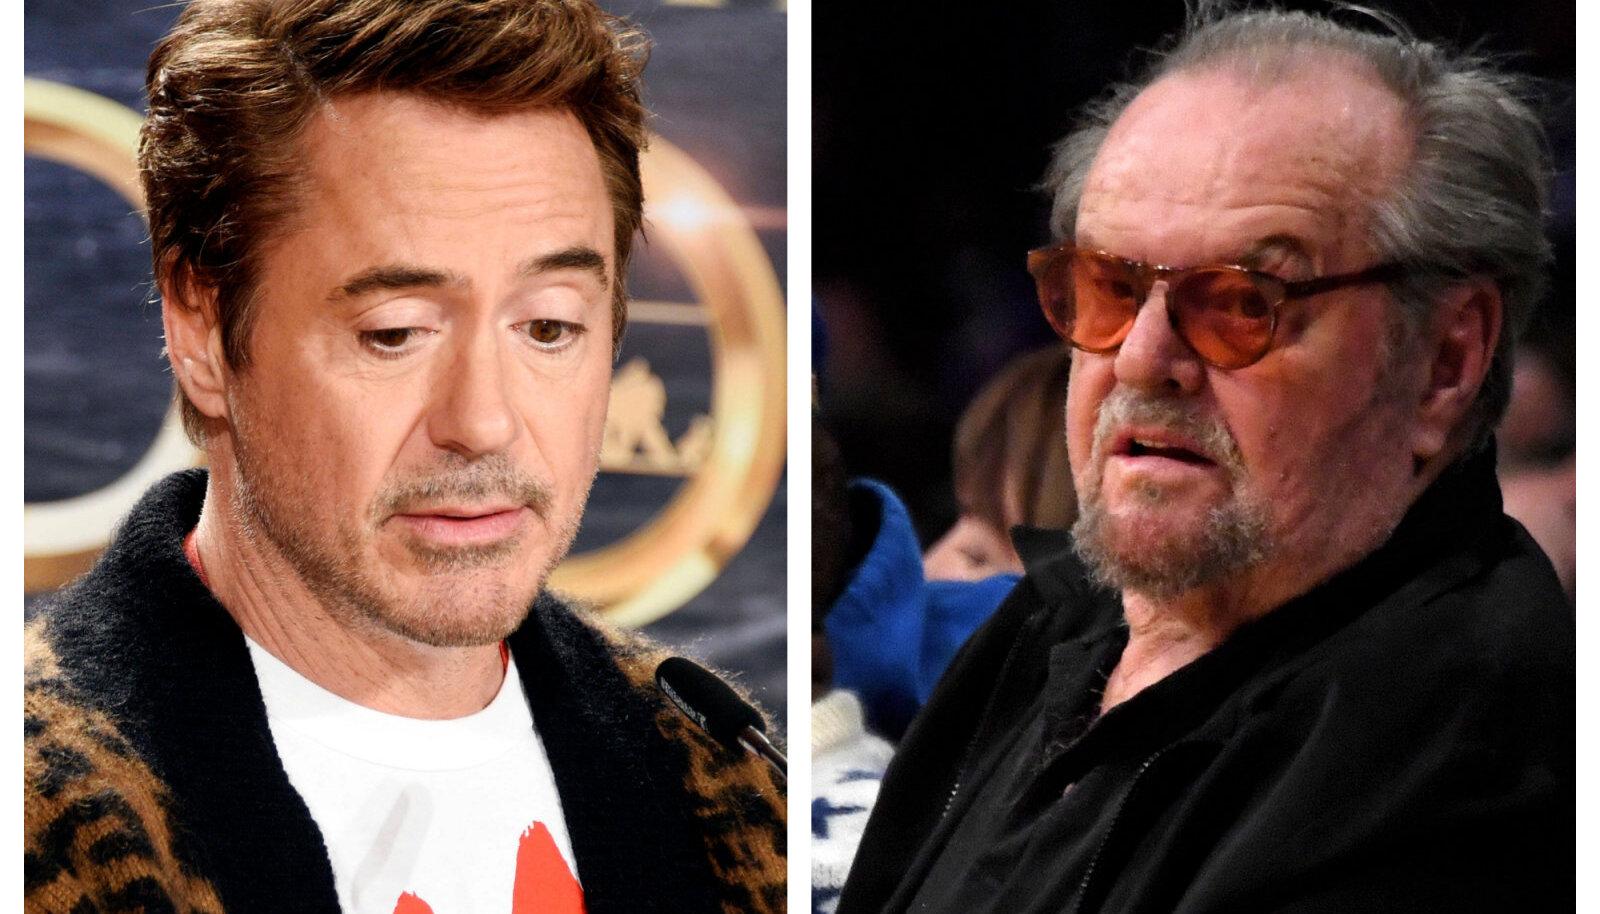 Robert Downey Jr/Jack Nicholson